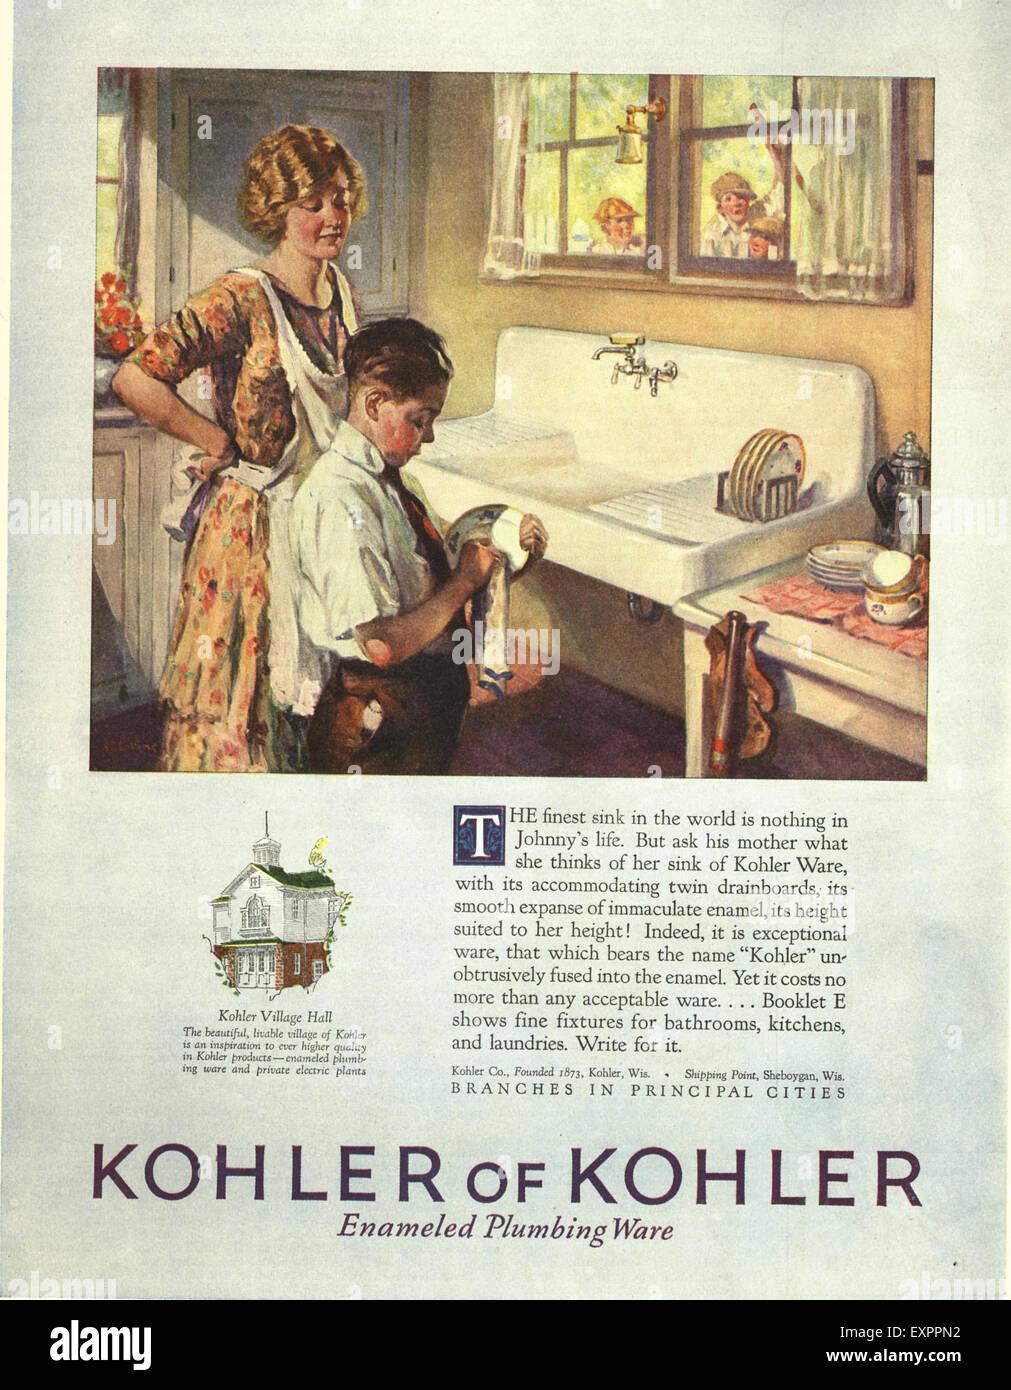 1920s USA Kohler of Kohler Magazine Advert Stock Photo, Royalty ...